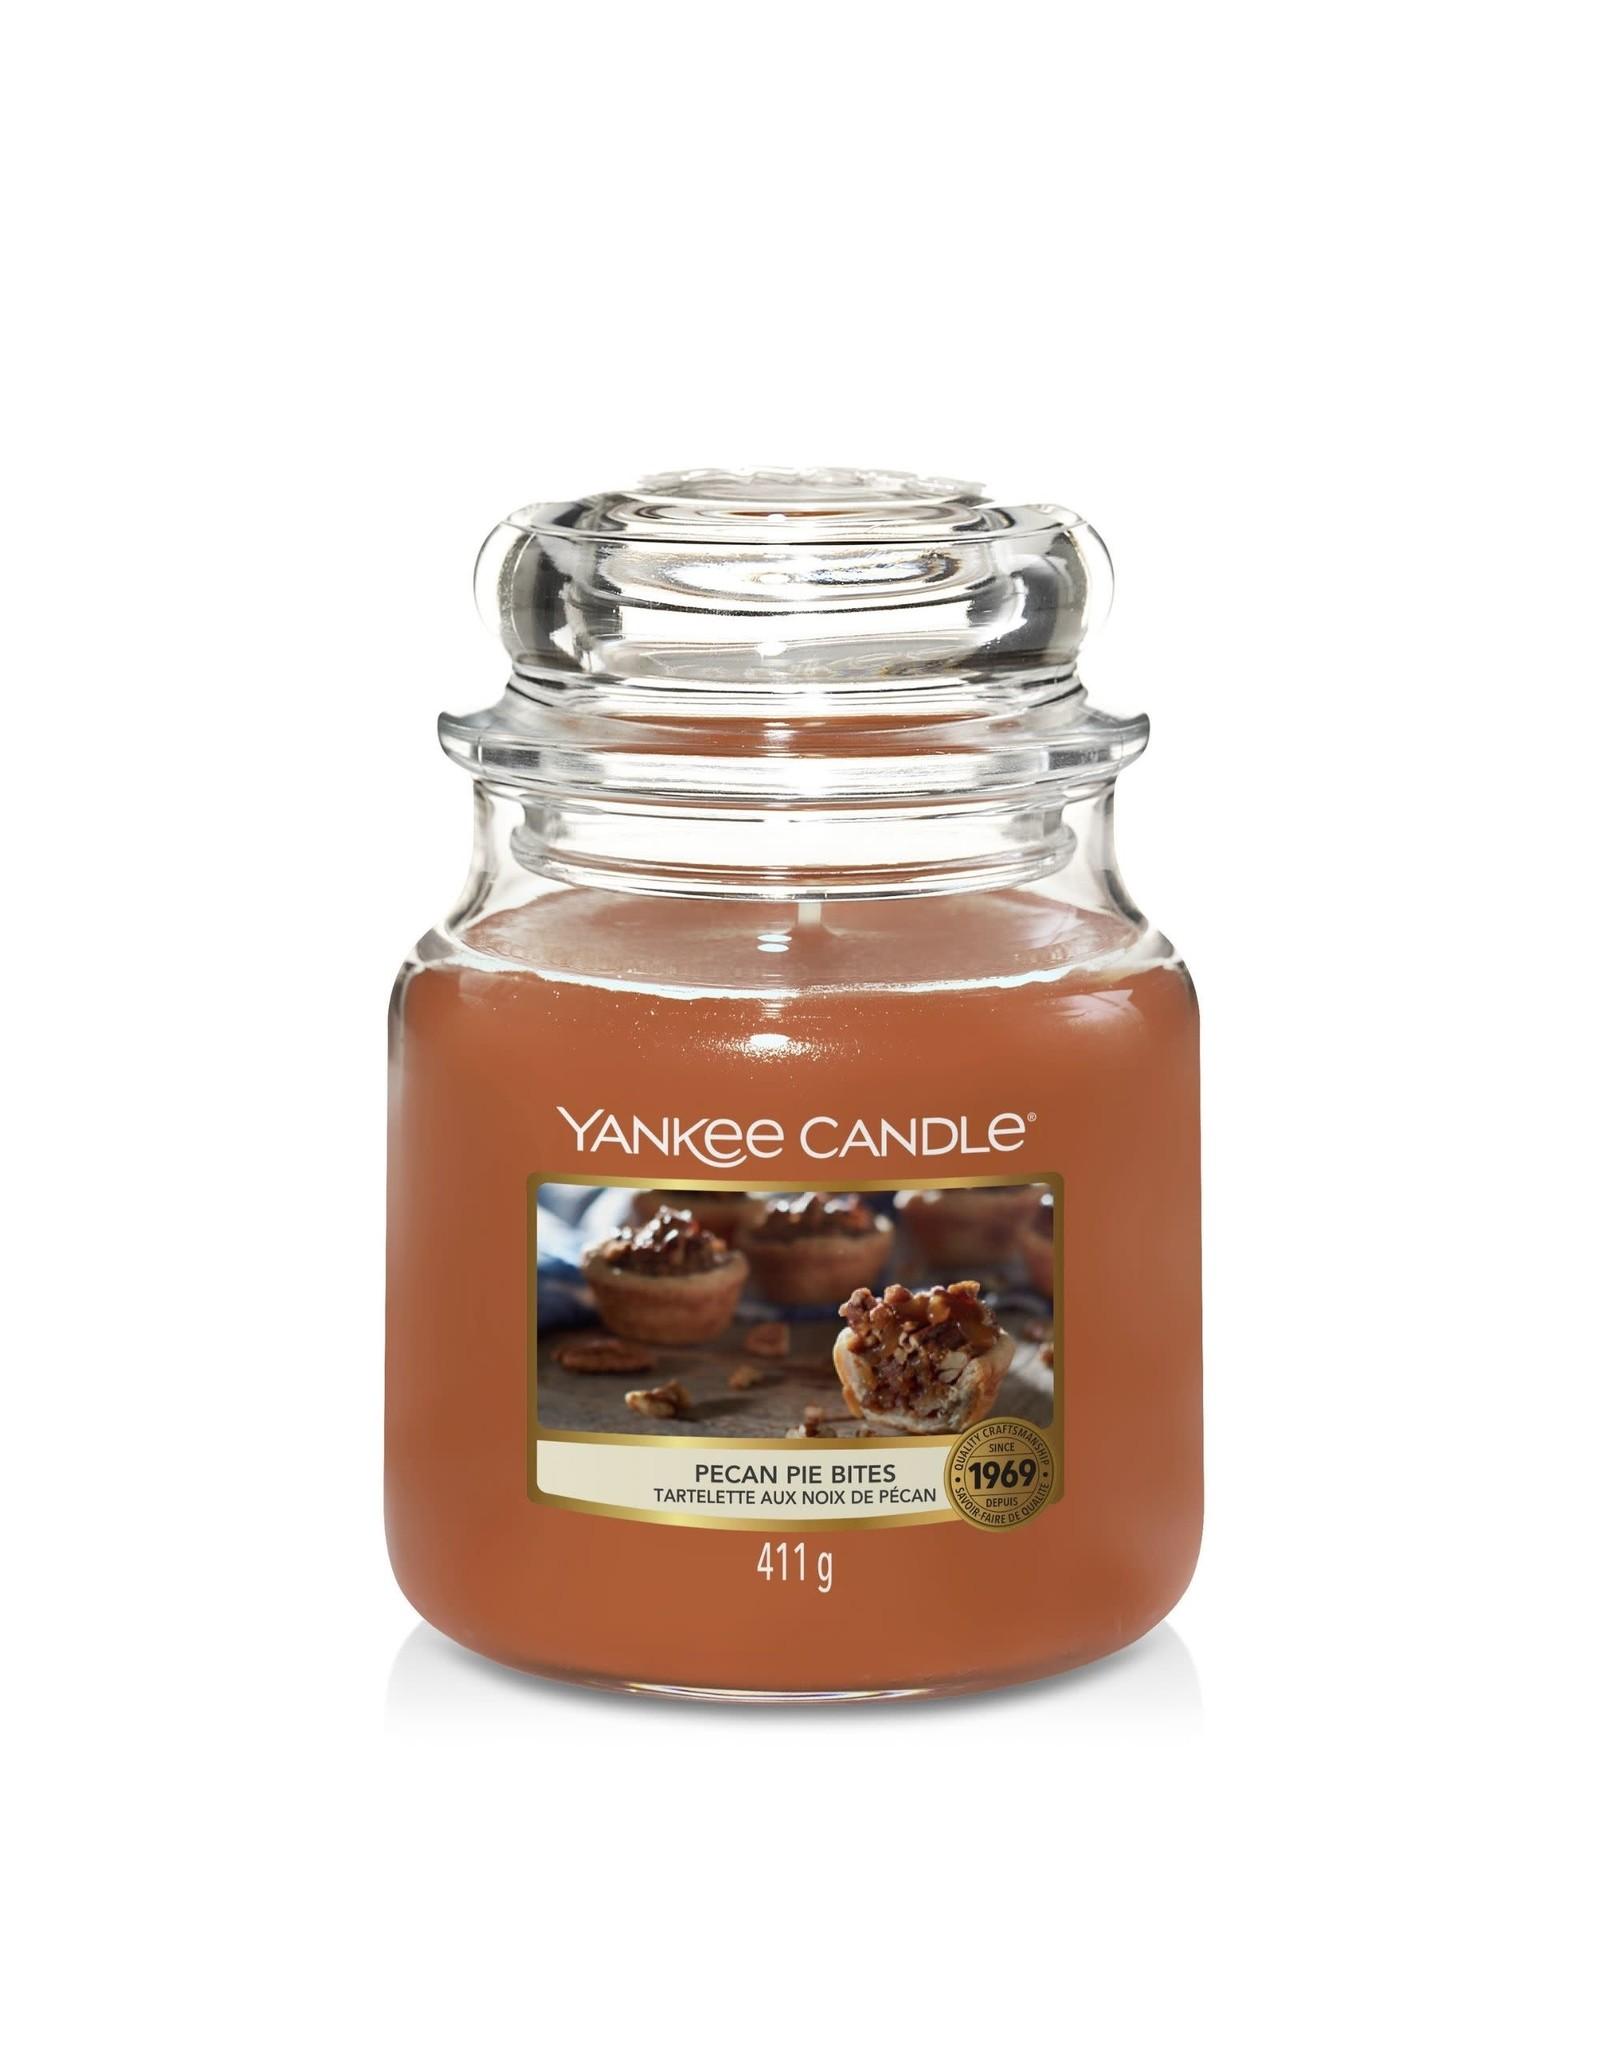 Yankee Candle Pecan Pie Bites - Medium Jar